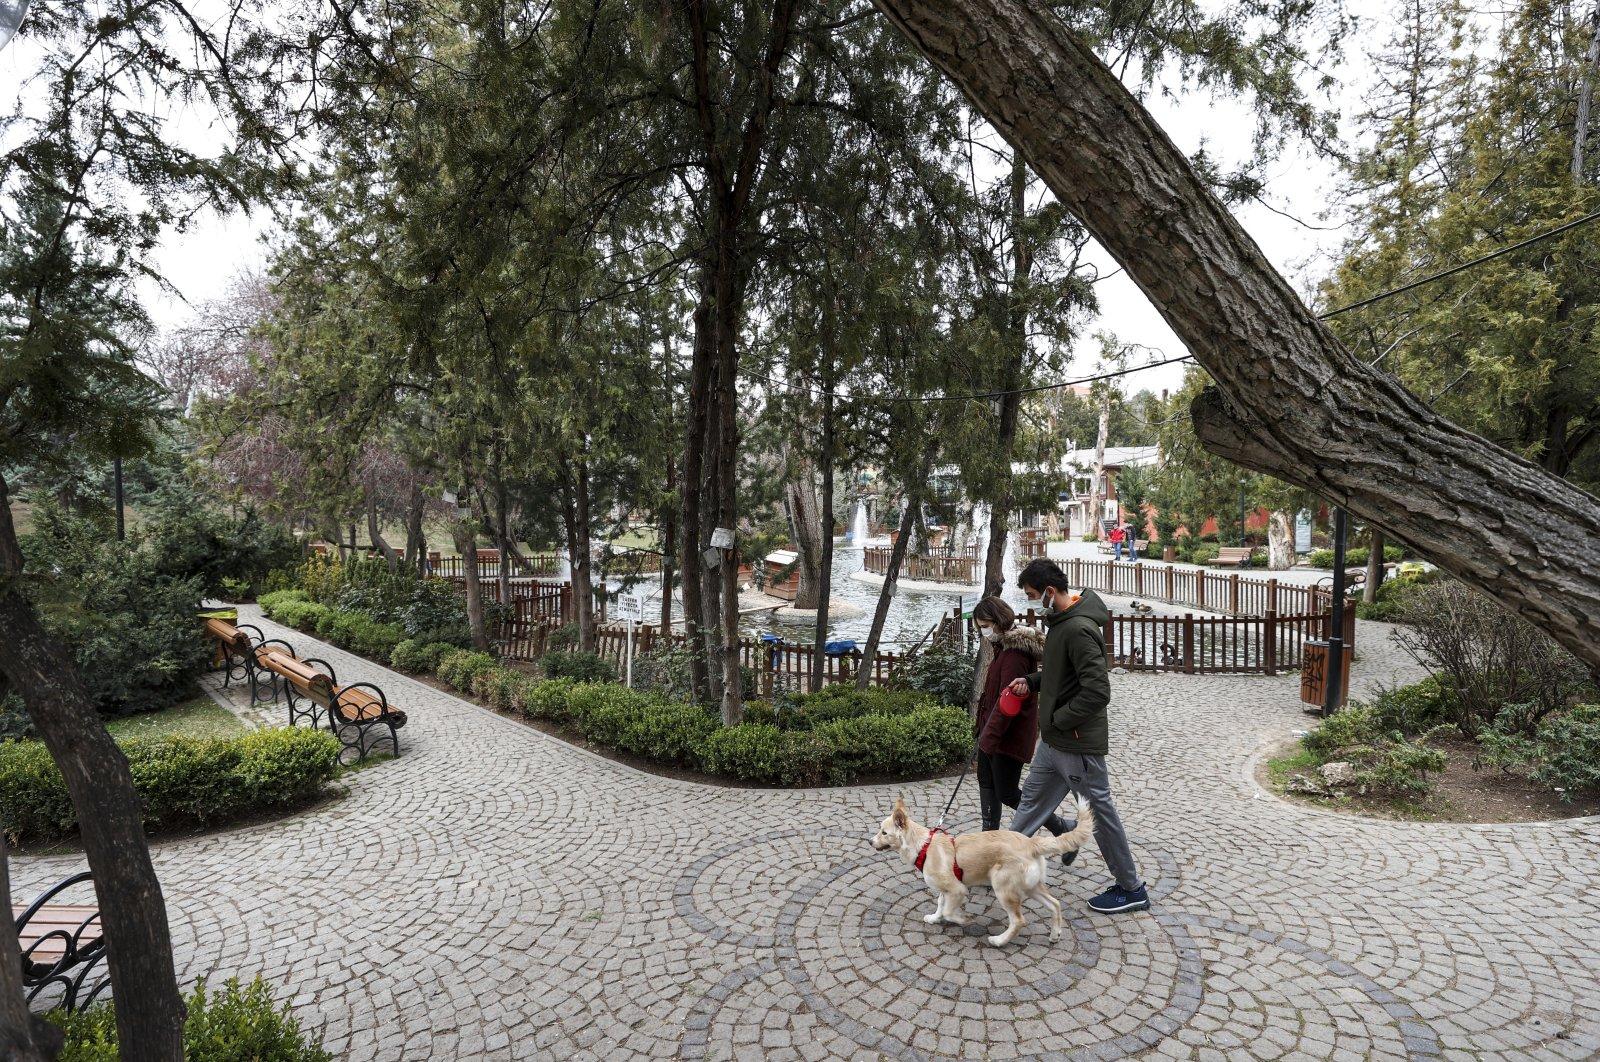 A man and a woman wearing protective masks walk a dog at a park in the capital Ankara, Turkey, Feb. 14, 2021. (AA PHOTO)